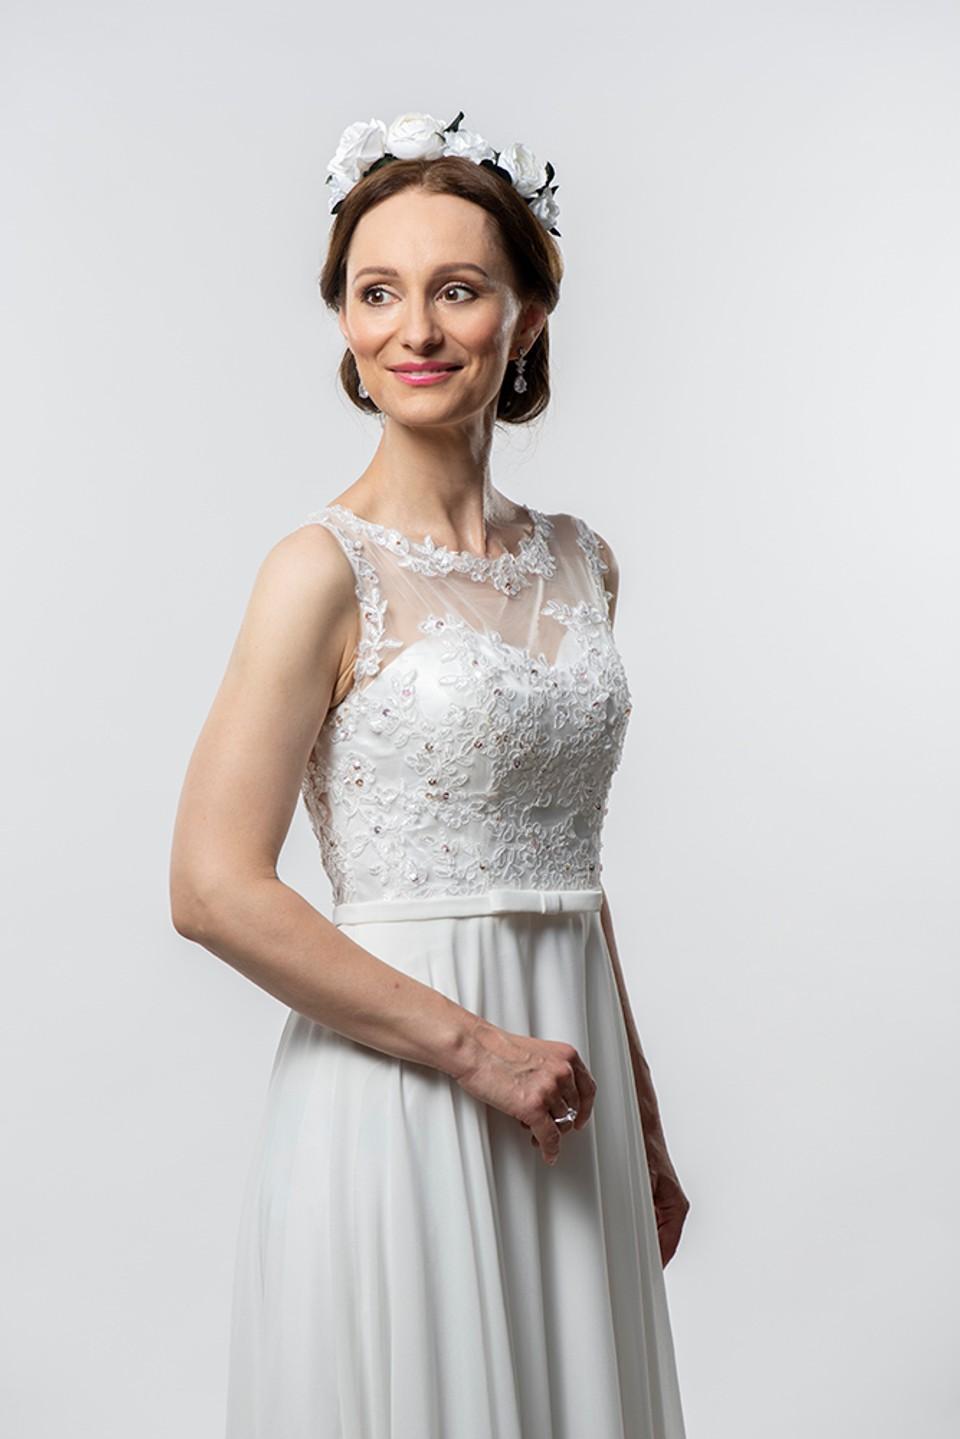 Karin Olasová